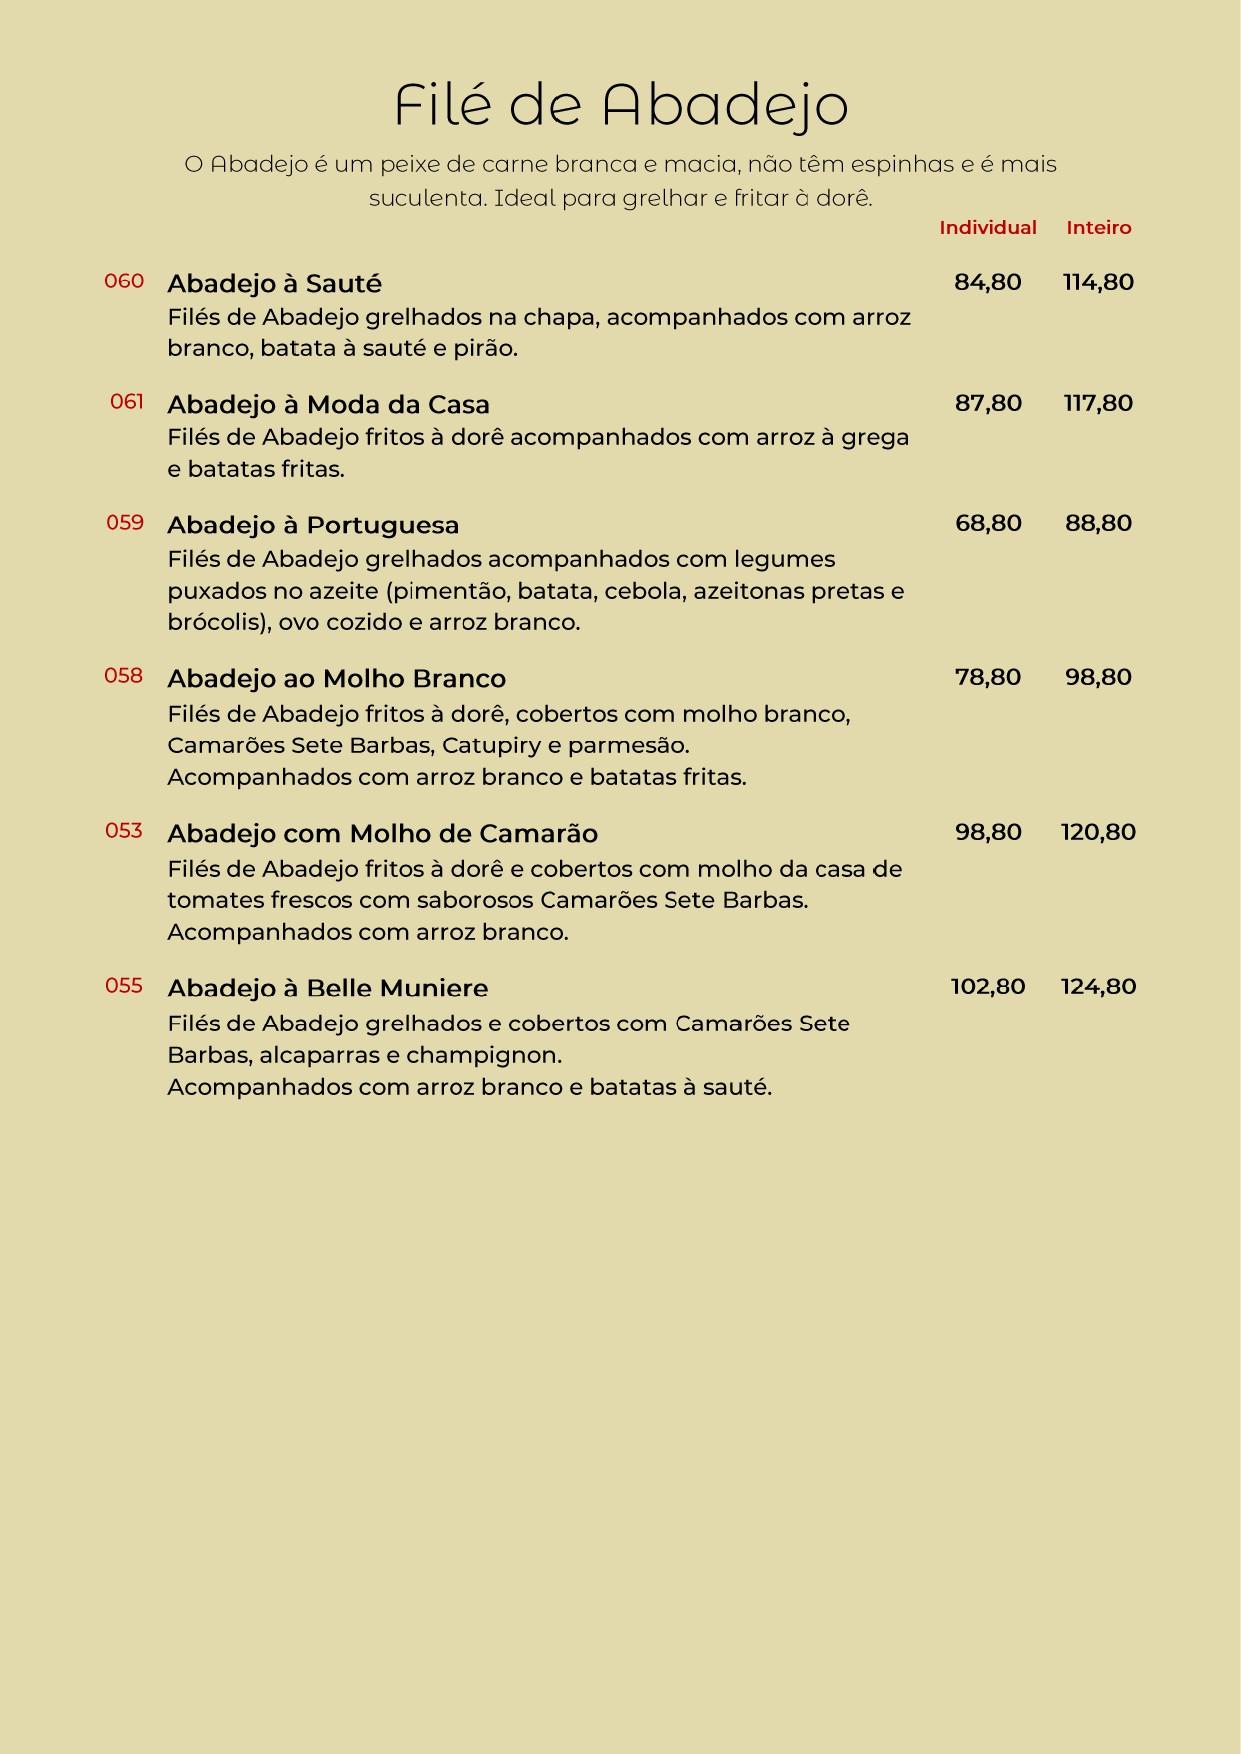 Cardápio Digital_page-0008.jpg